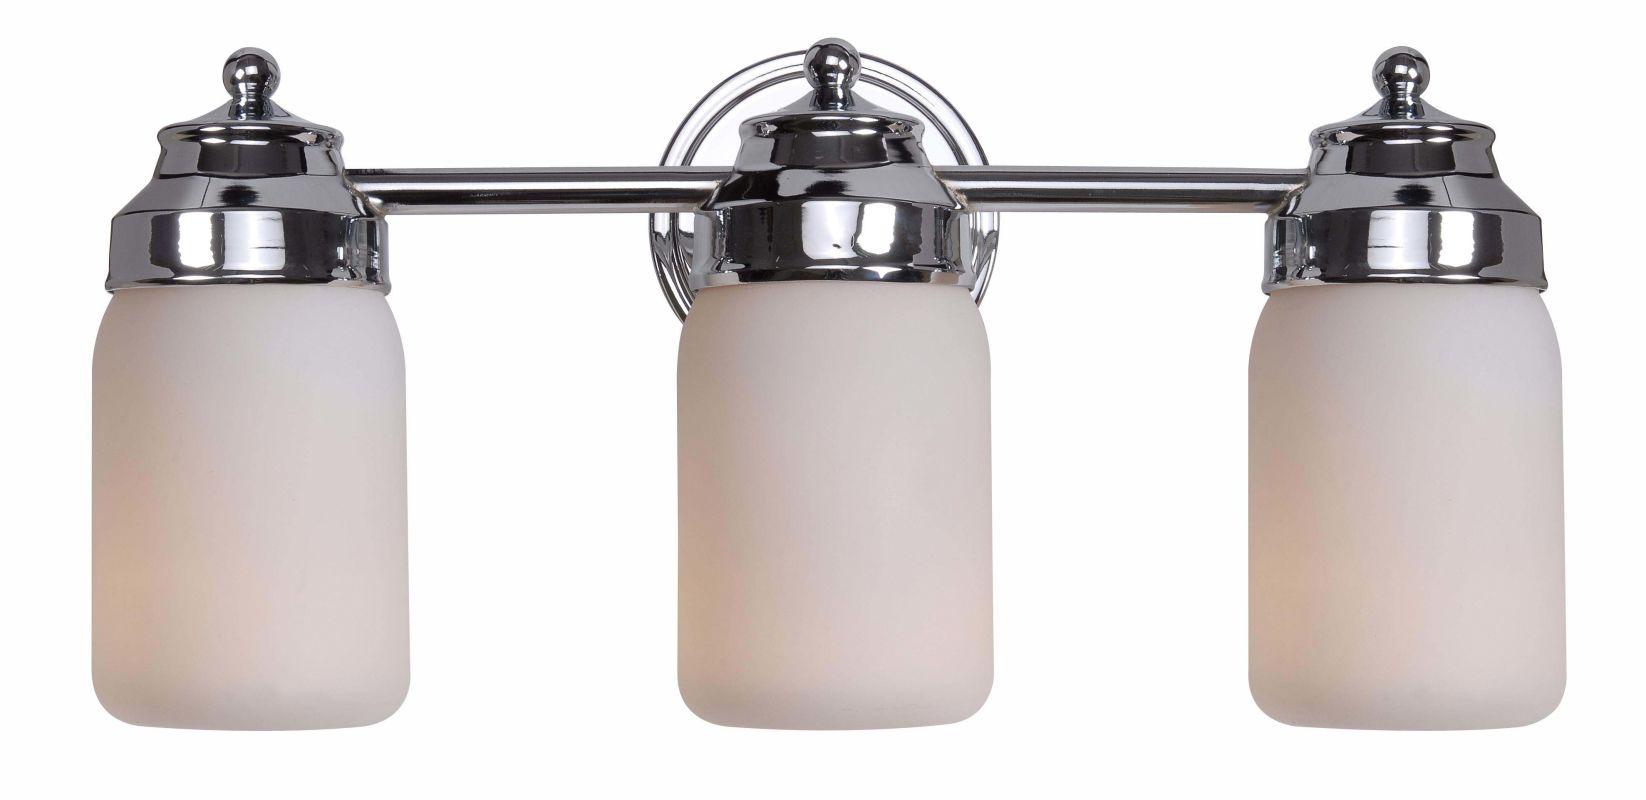 Kenroy Home 93463ch Chrome Midtown 3 Light Bathroom Vanity